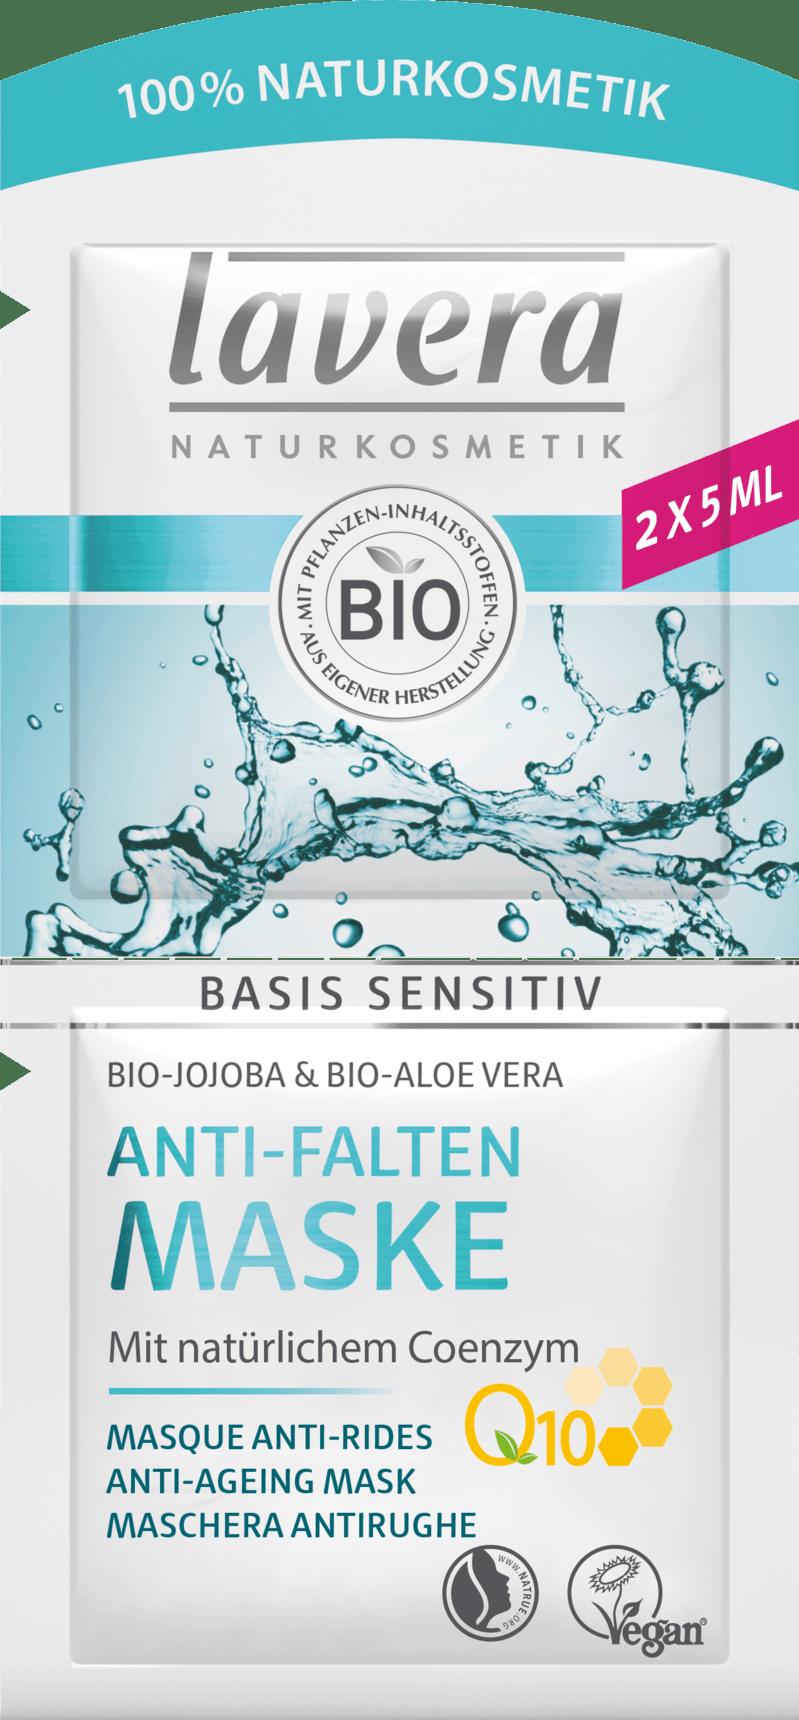 Masque Base Sensible Q10 au Jojoba bio, Aloe Vera bio & Coenzyme Q10